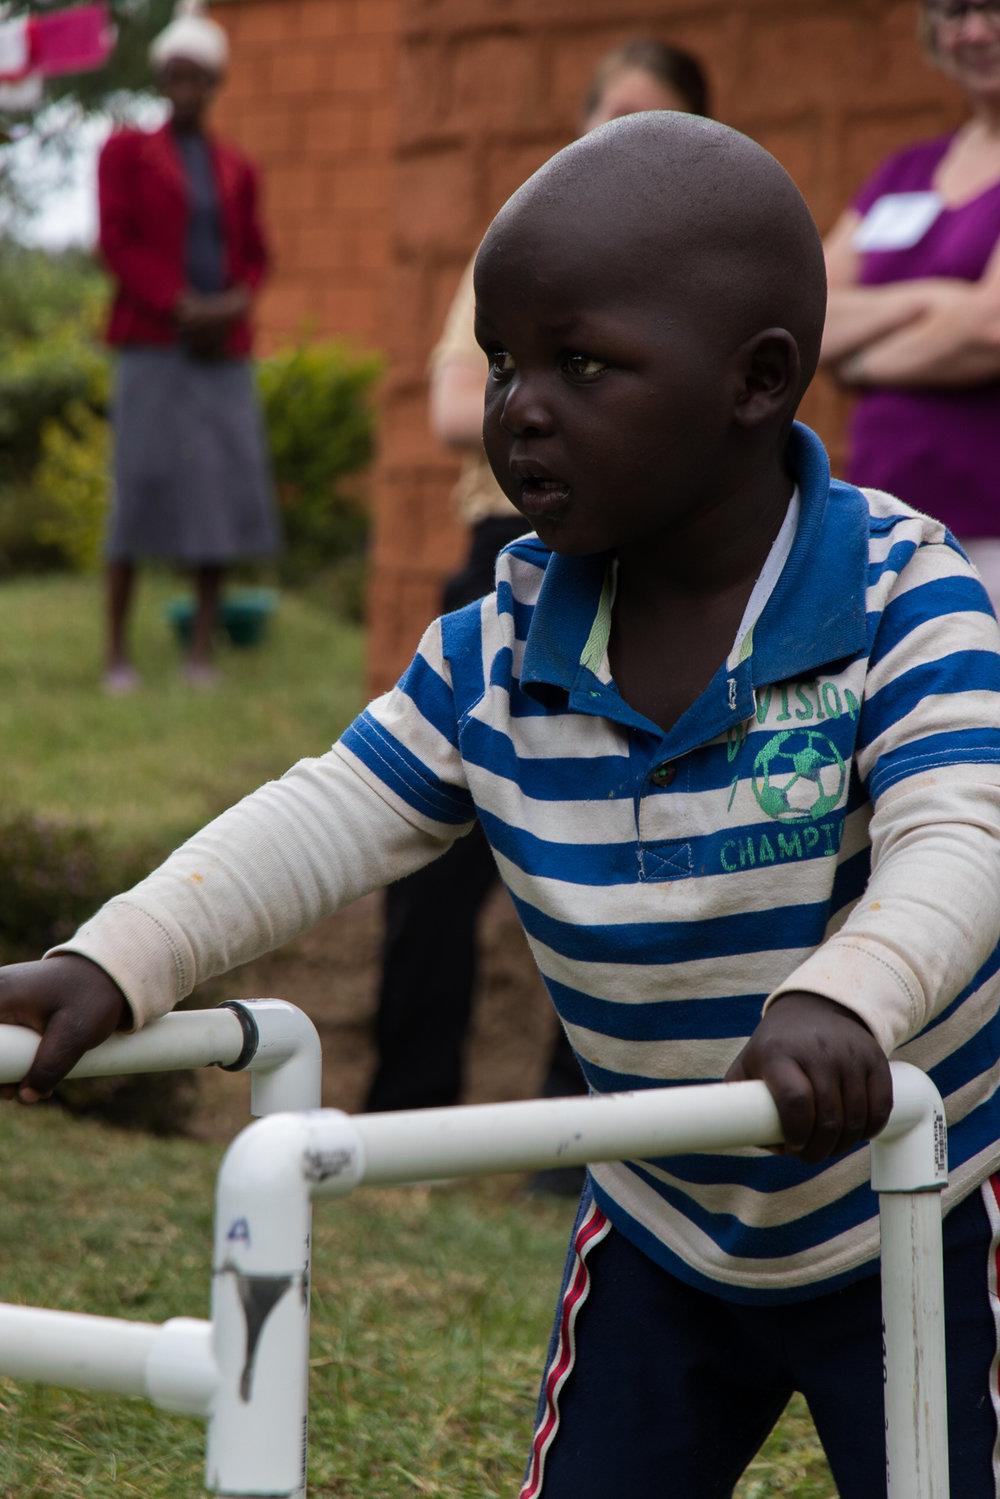 abwcanada_kenya_child_portrait-1.JPG